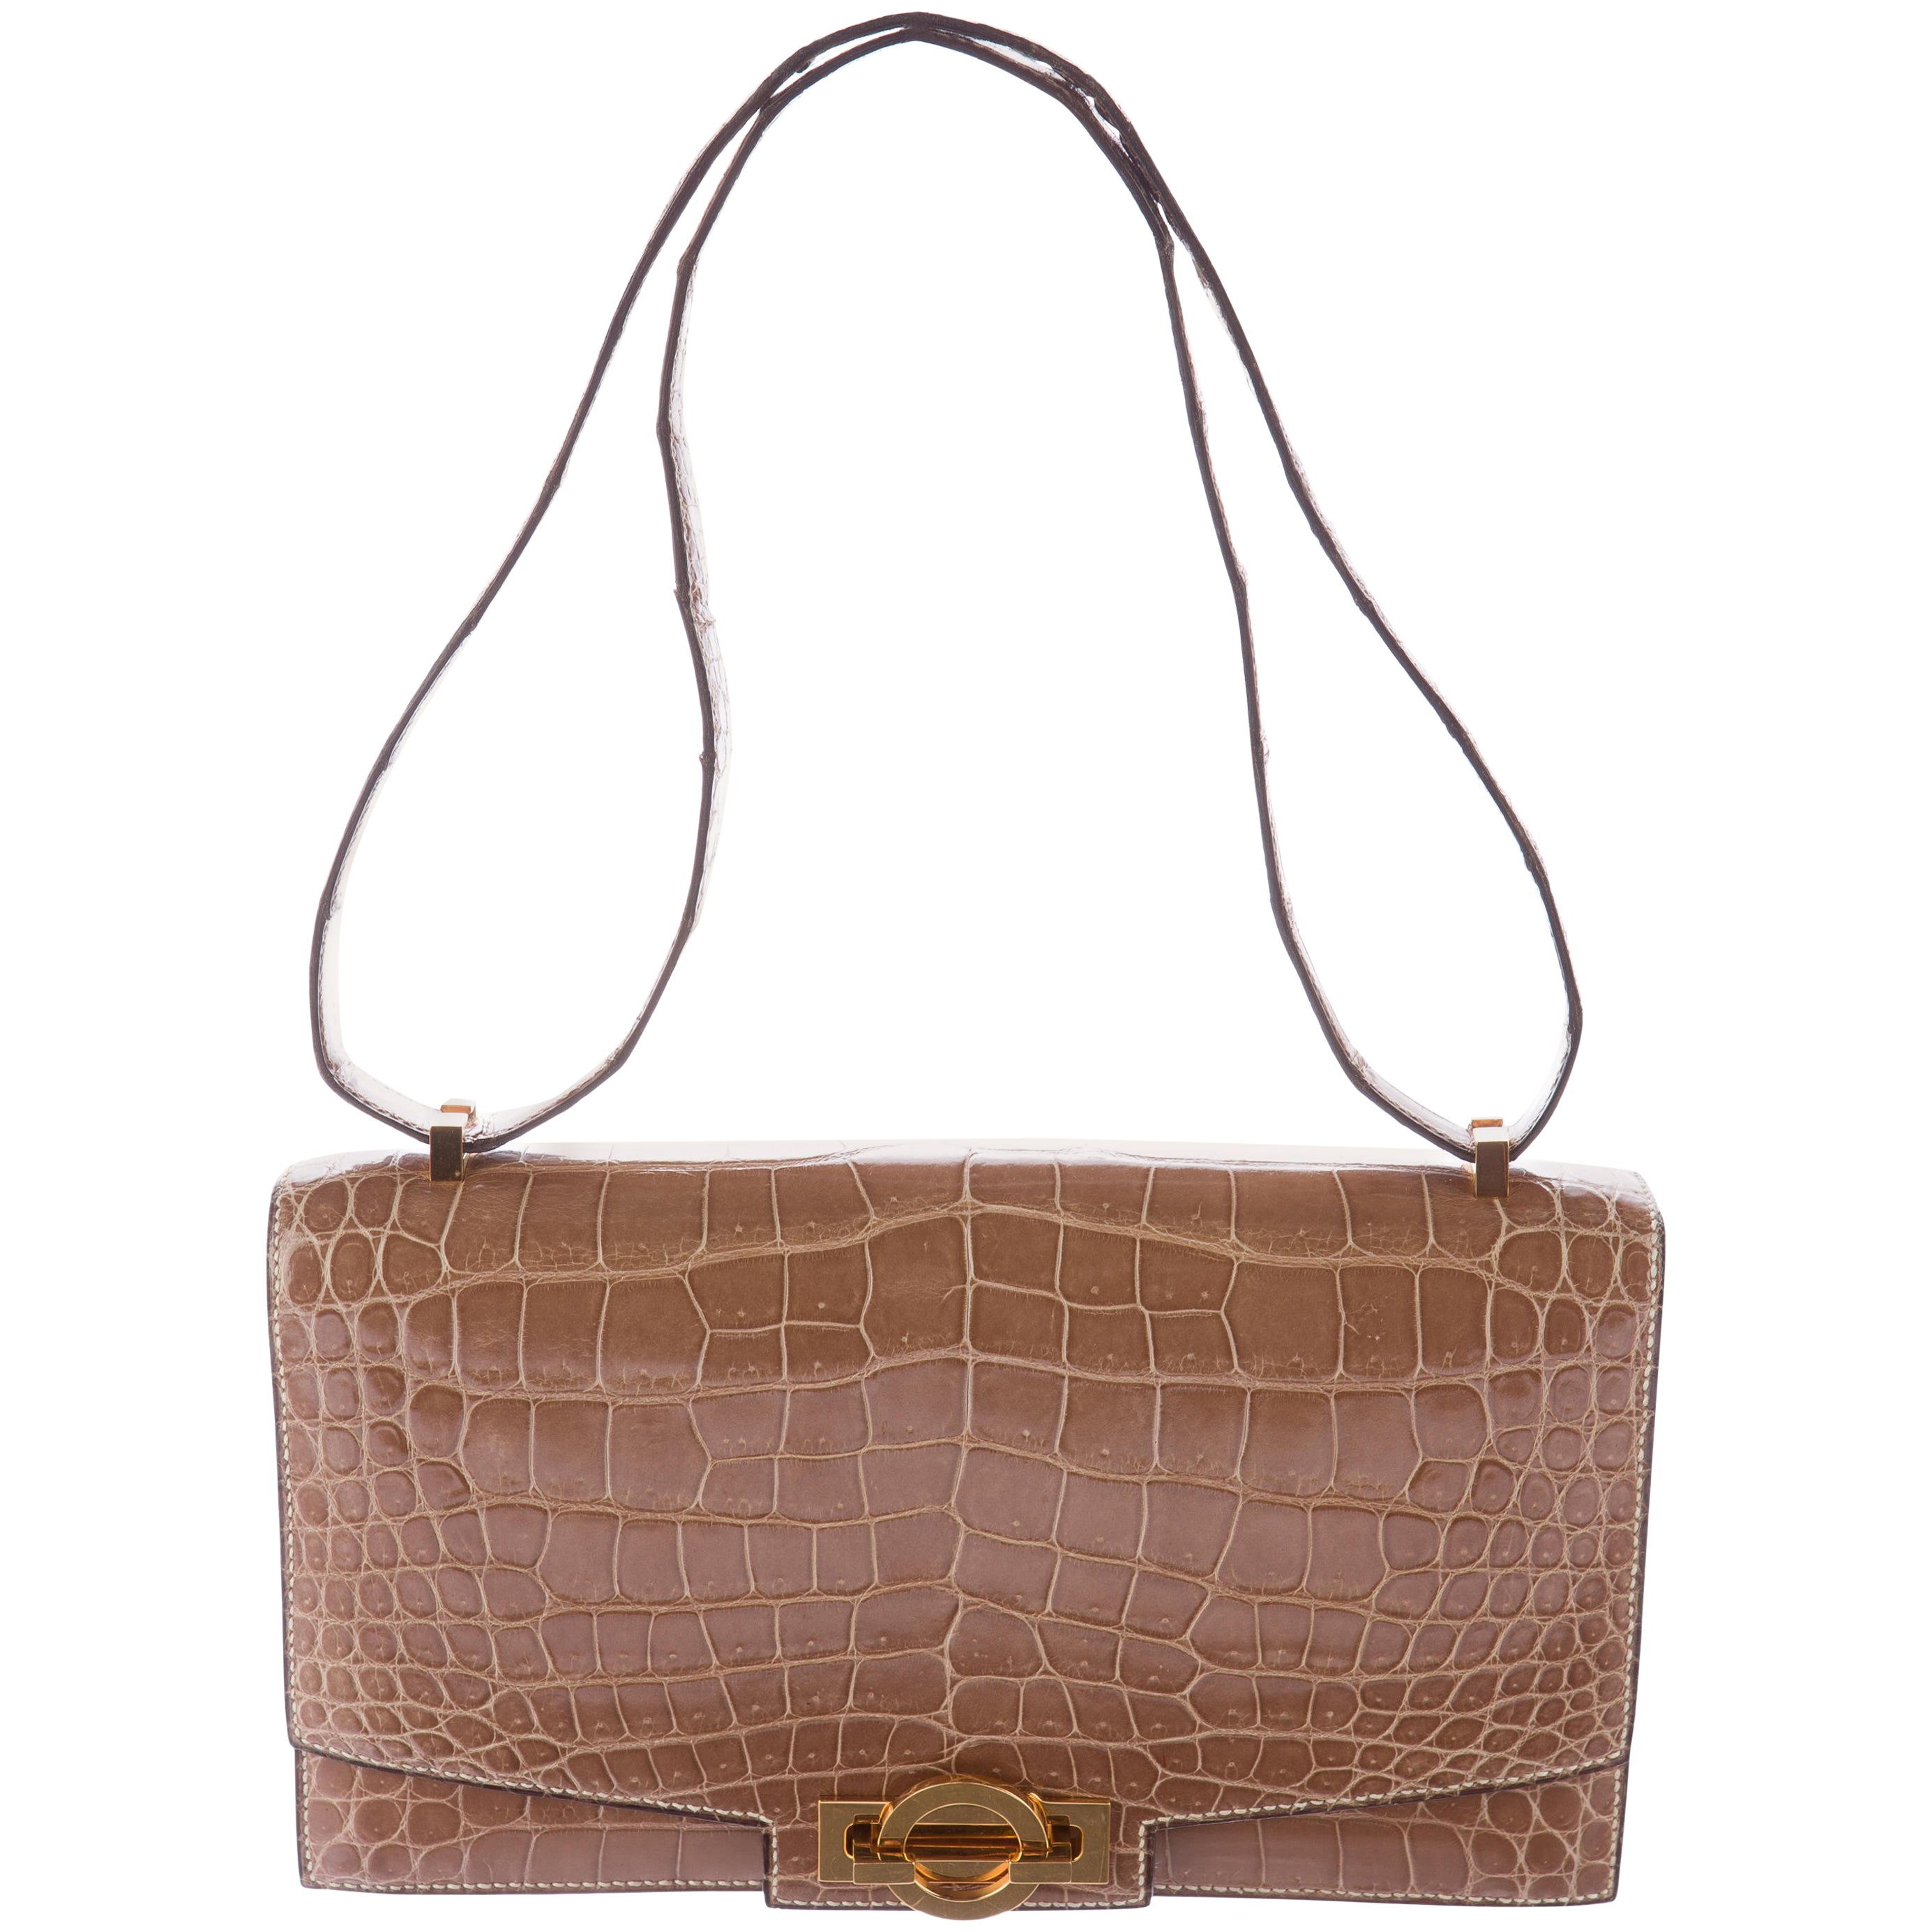 Hermes Cognac Crocodile Exotic Leather Kelly Top Handle Shoulder Flap Bag